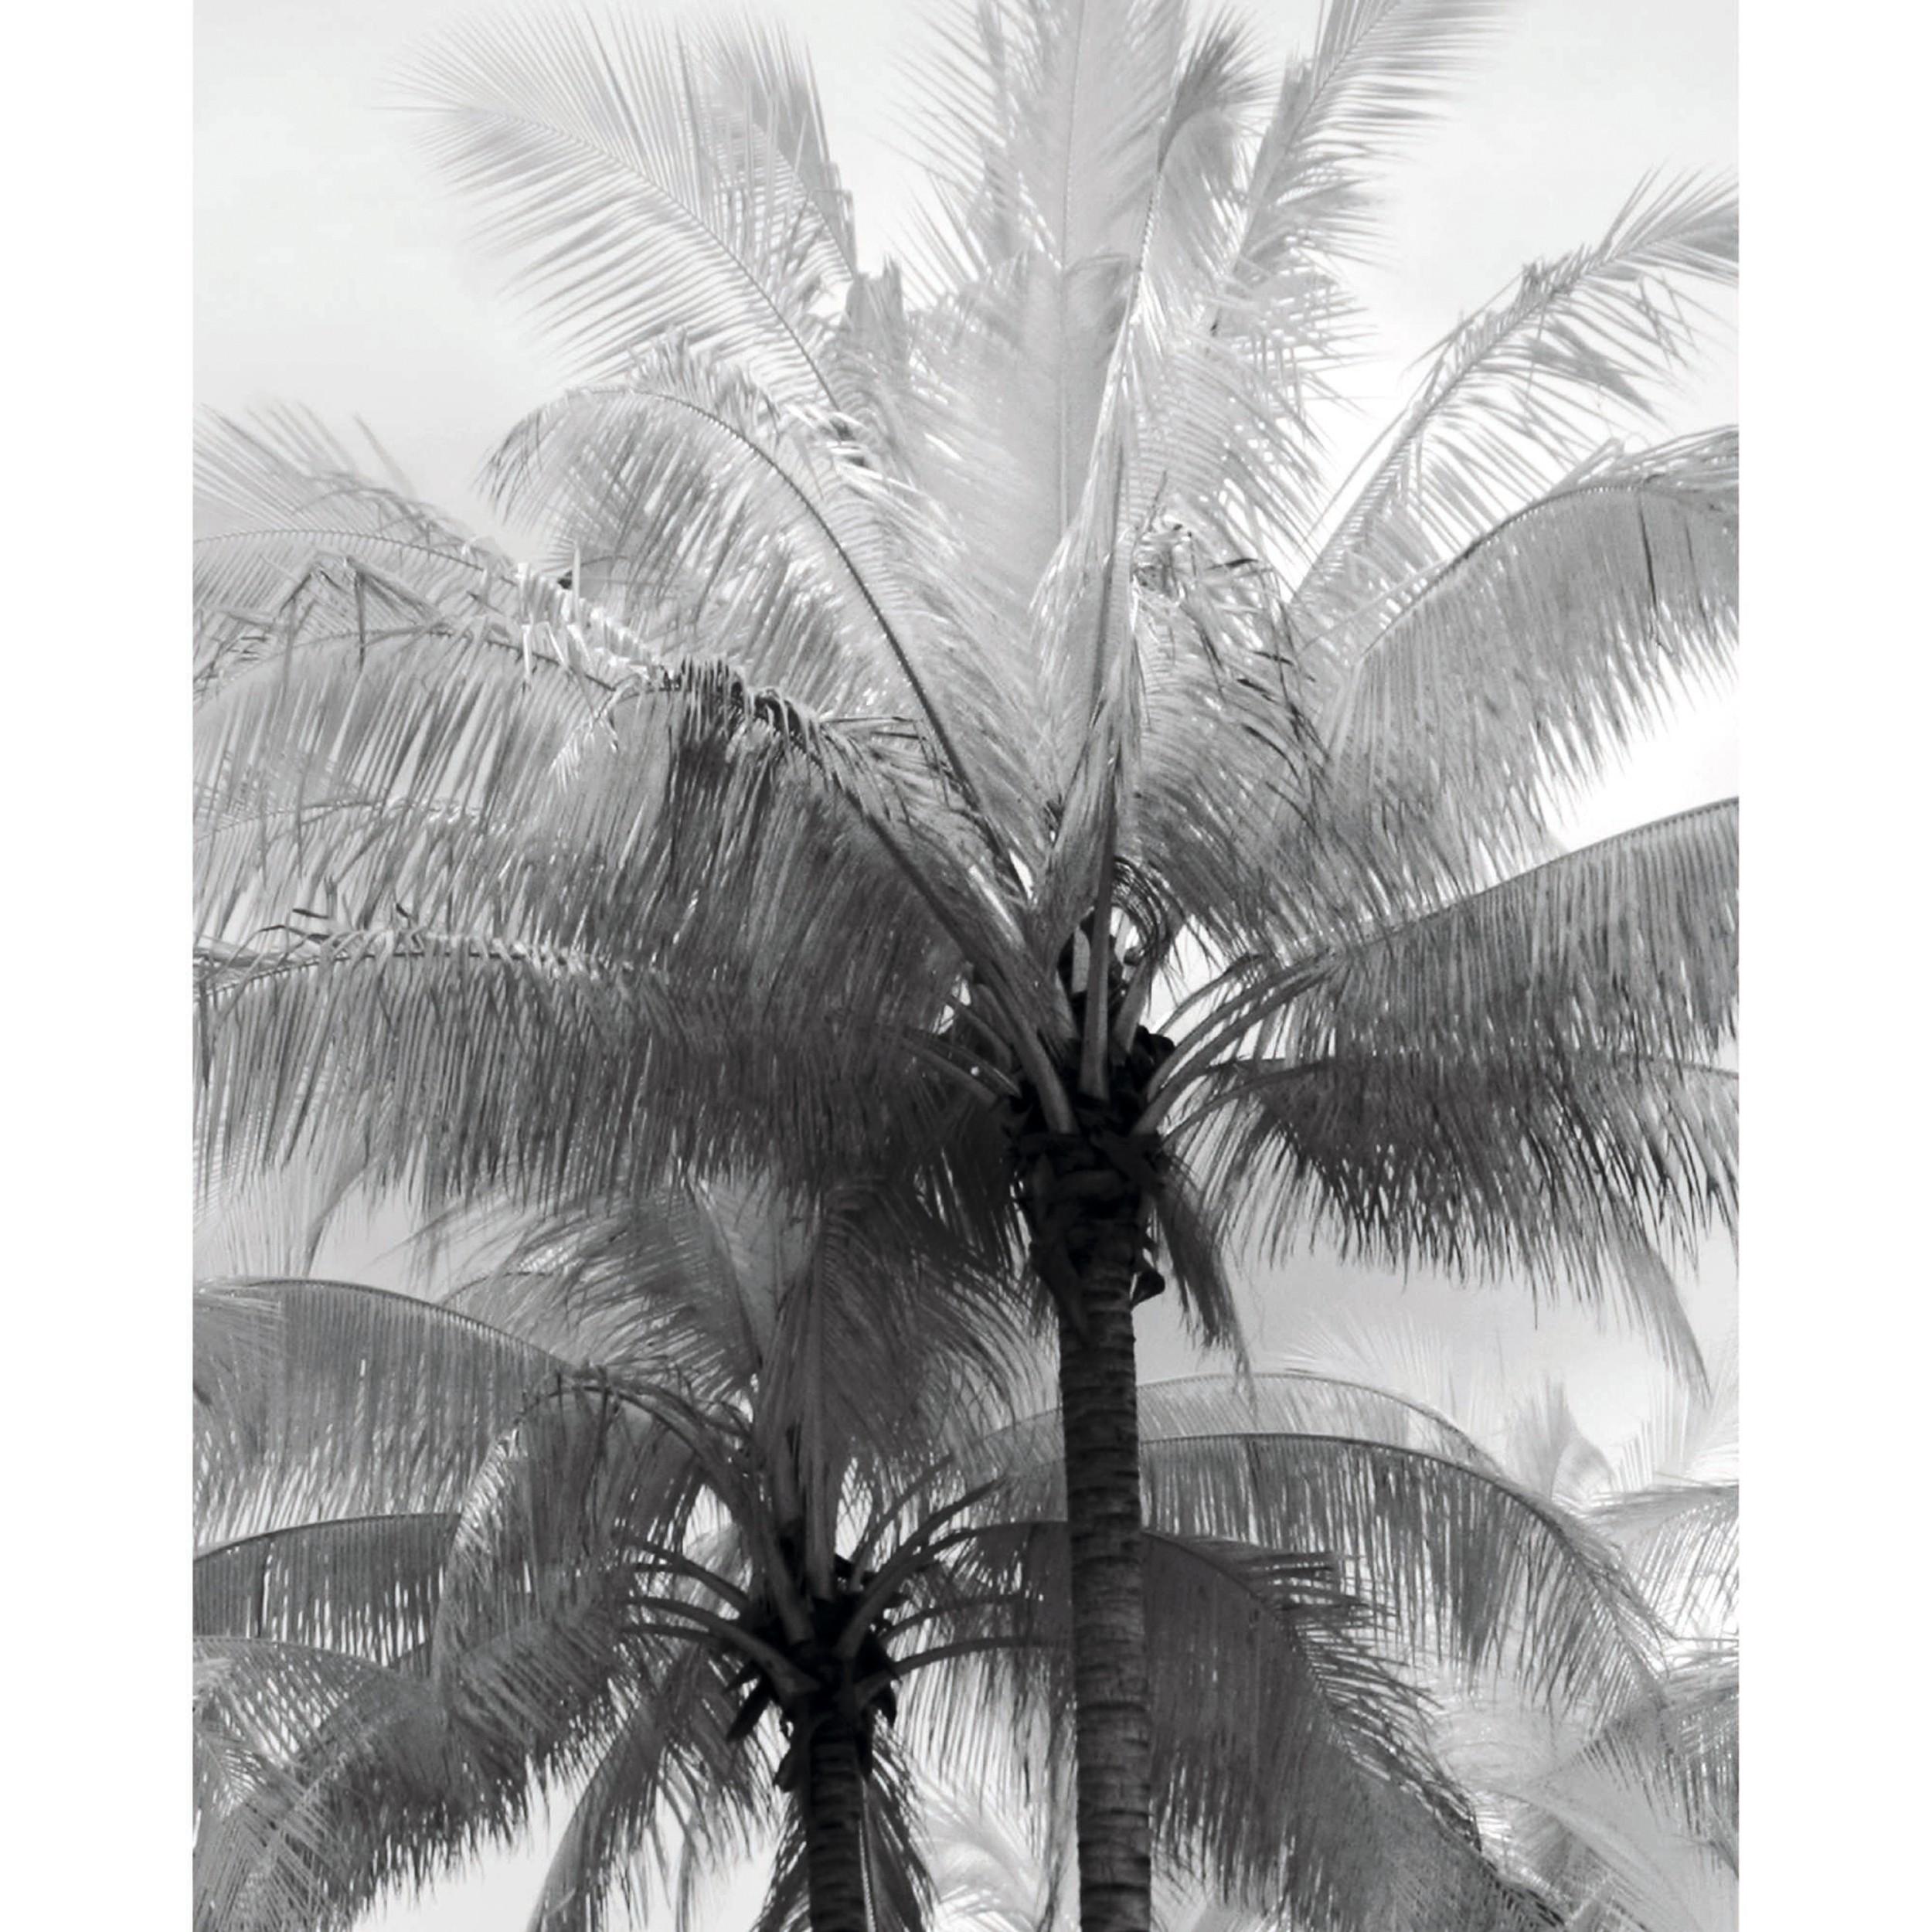 acheter poster palmier 40 x 50 noir blanc